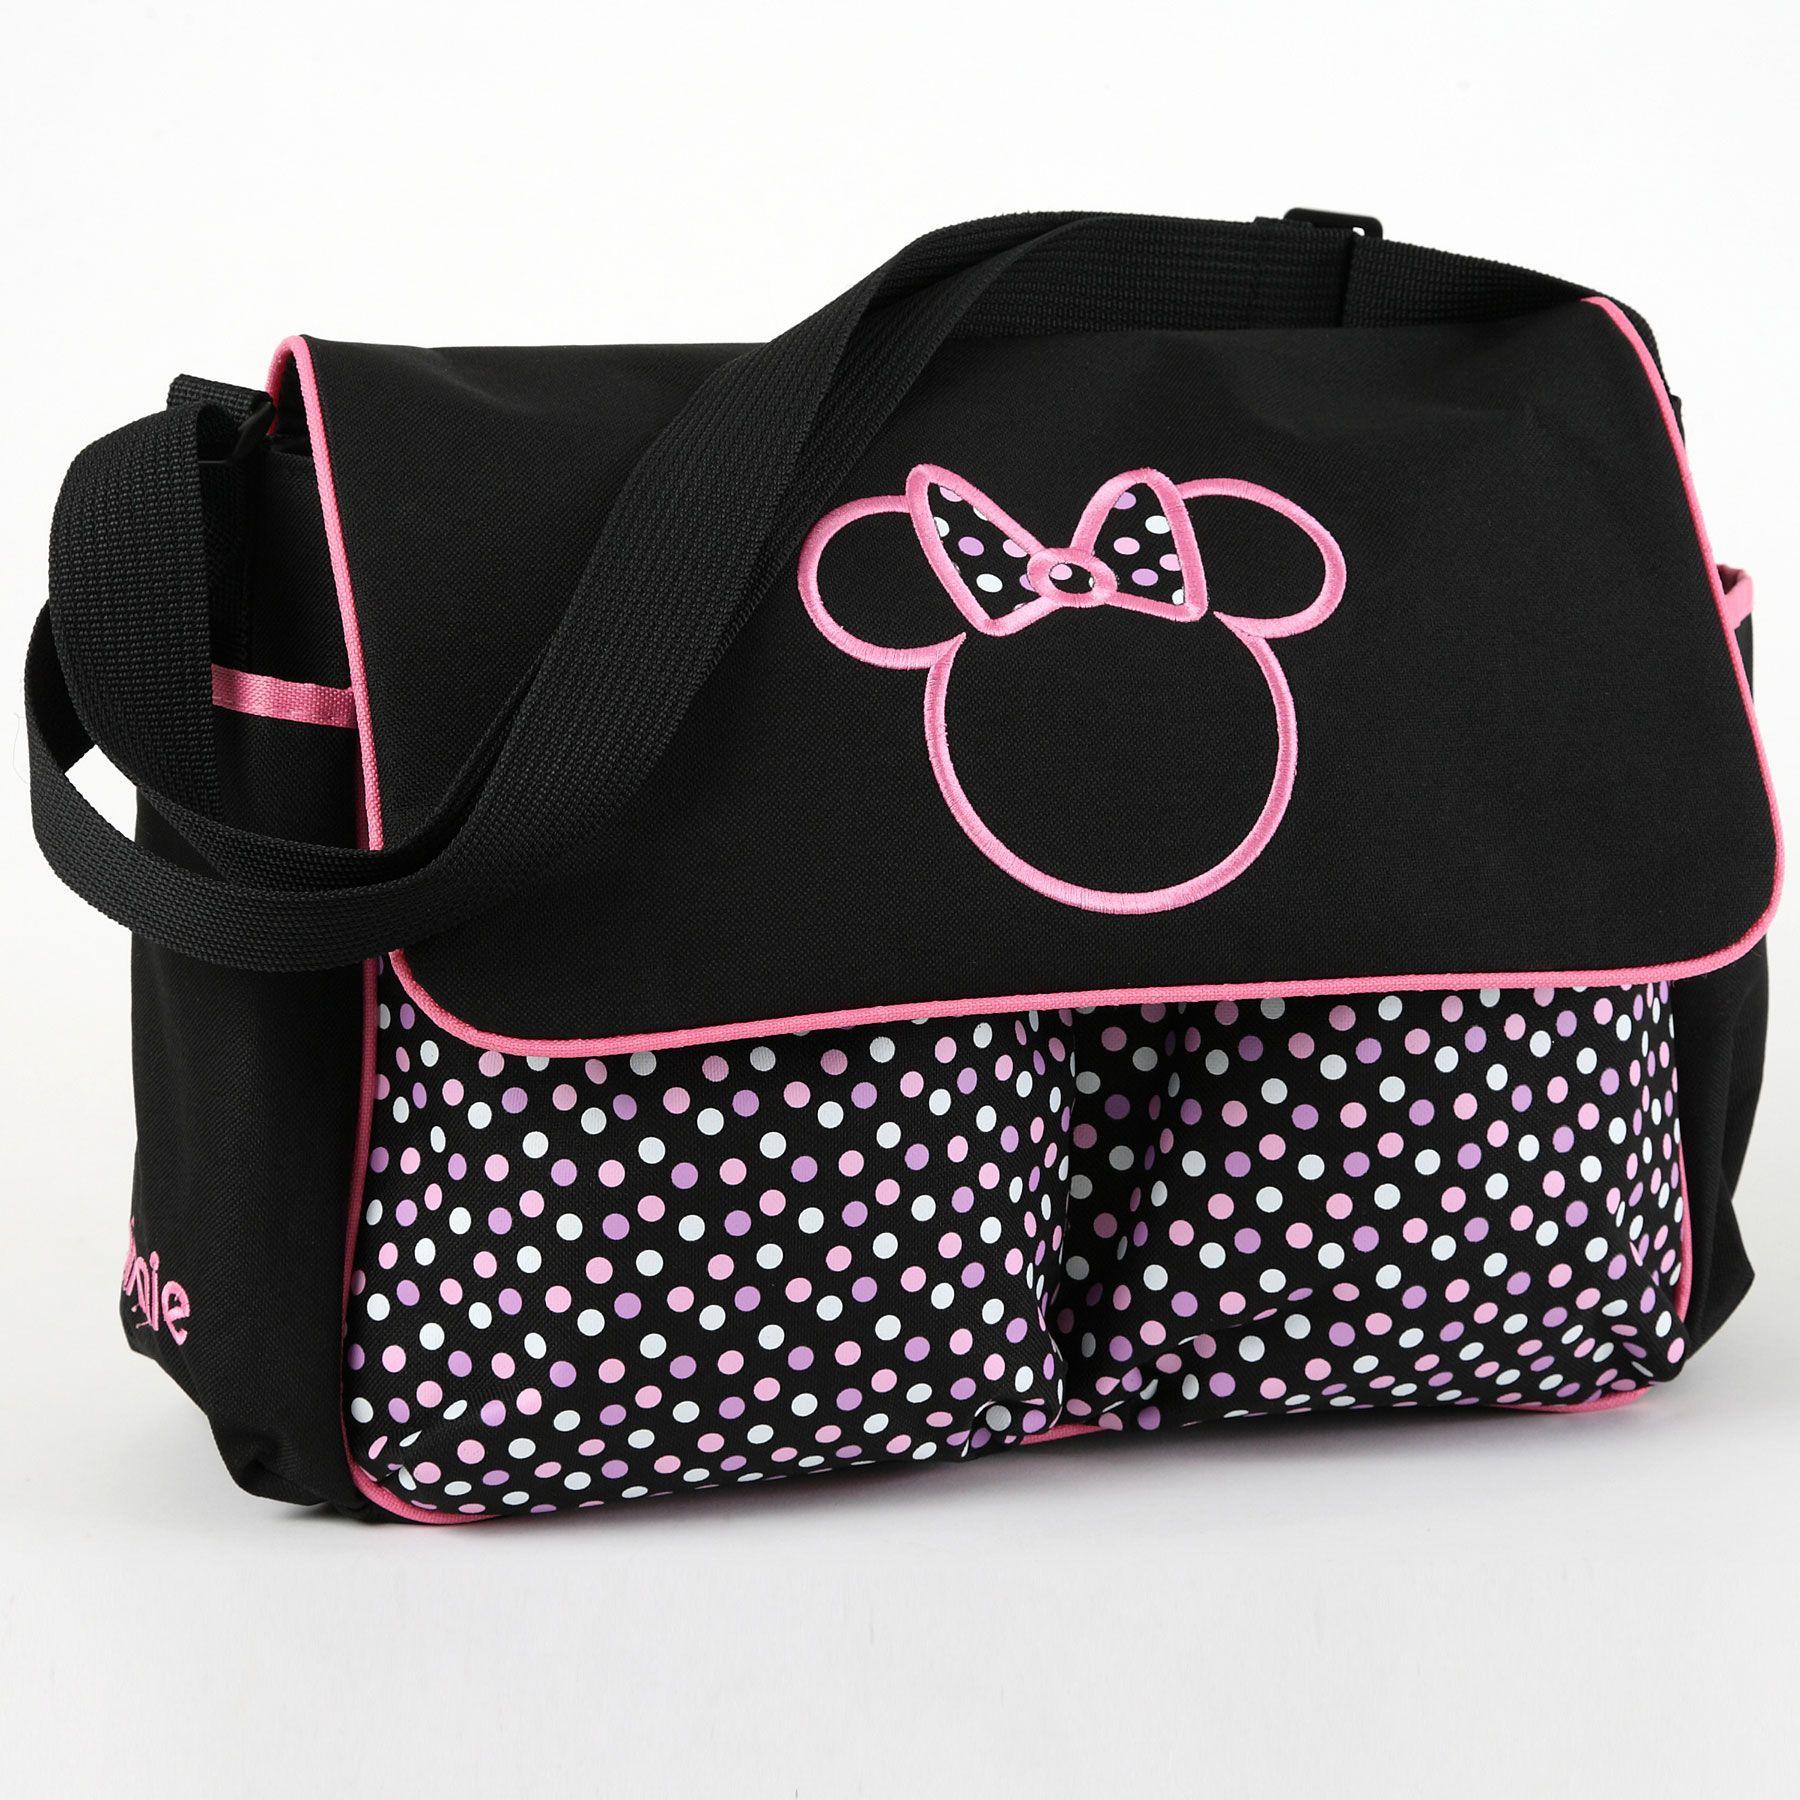 Minnie Mouse Diaper Bag MINNIE MOUSE Large Dia...